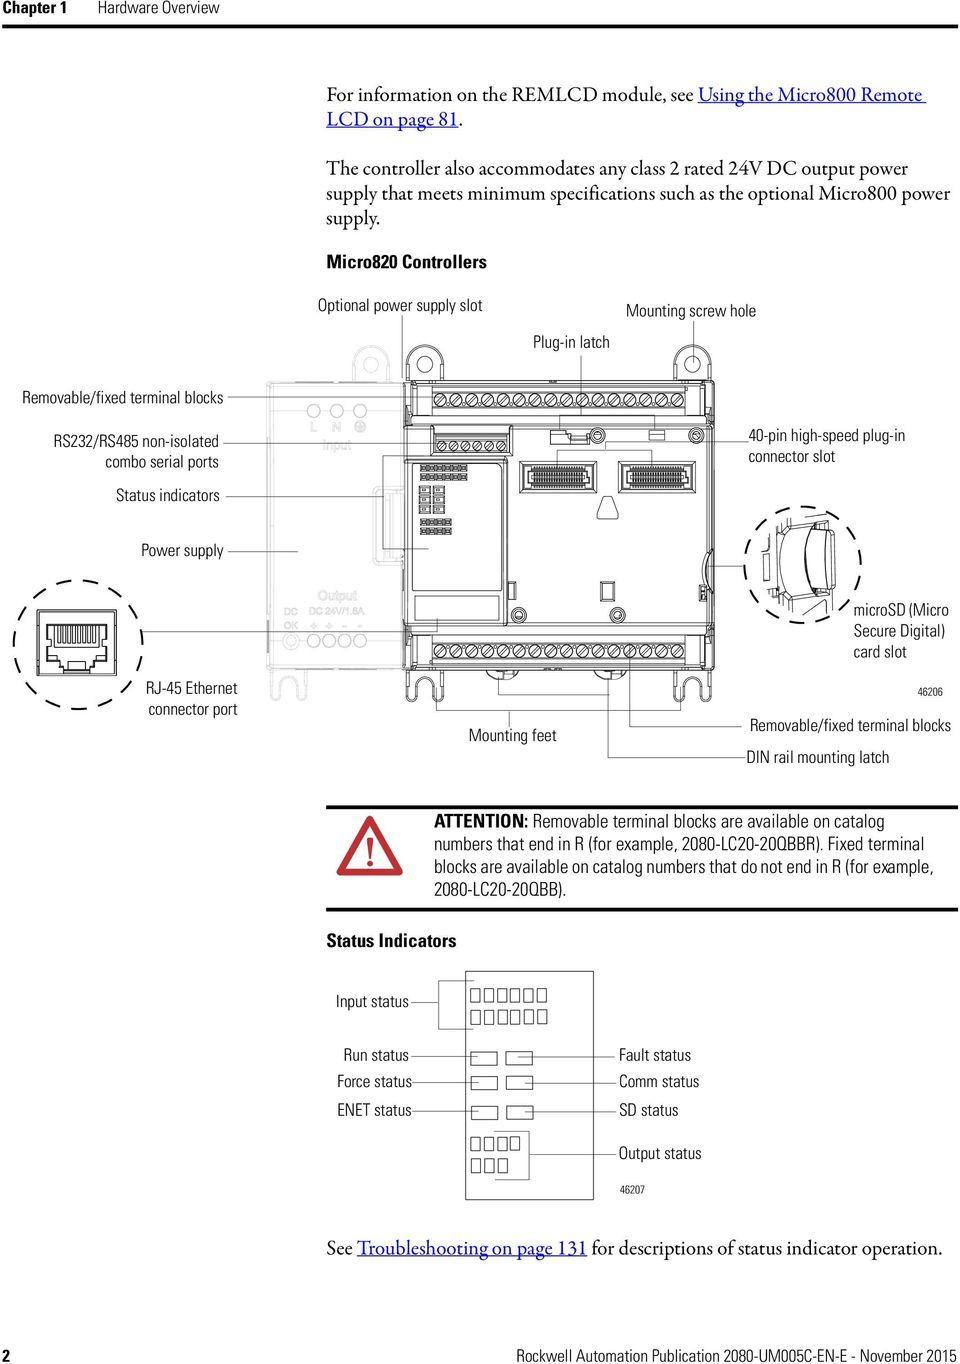 Micro820 Plc Wiring Diagram Bookingritzcarlton Info Electrical Wiring Diagram Electrical Diagram Diagram